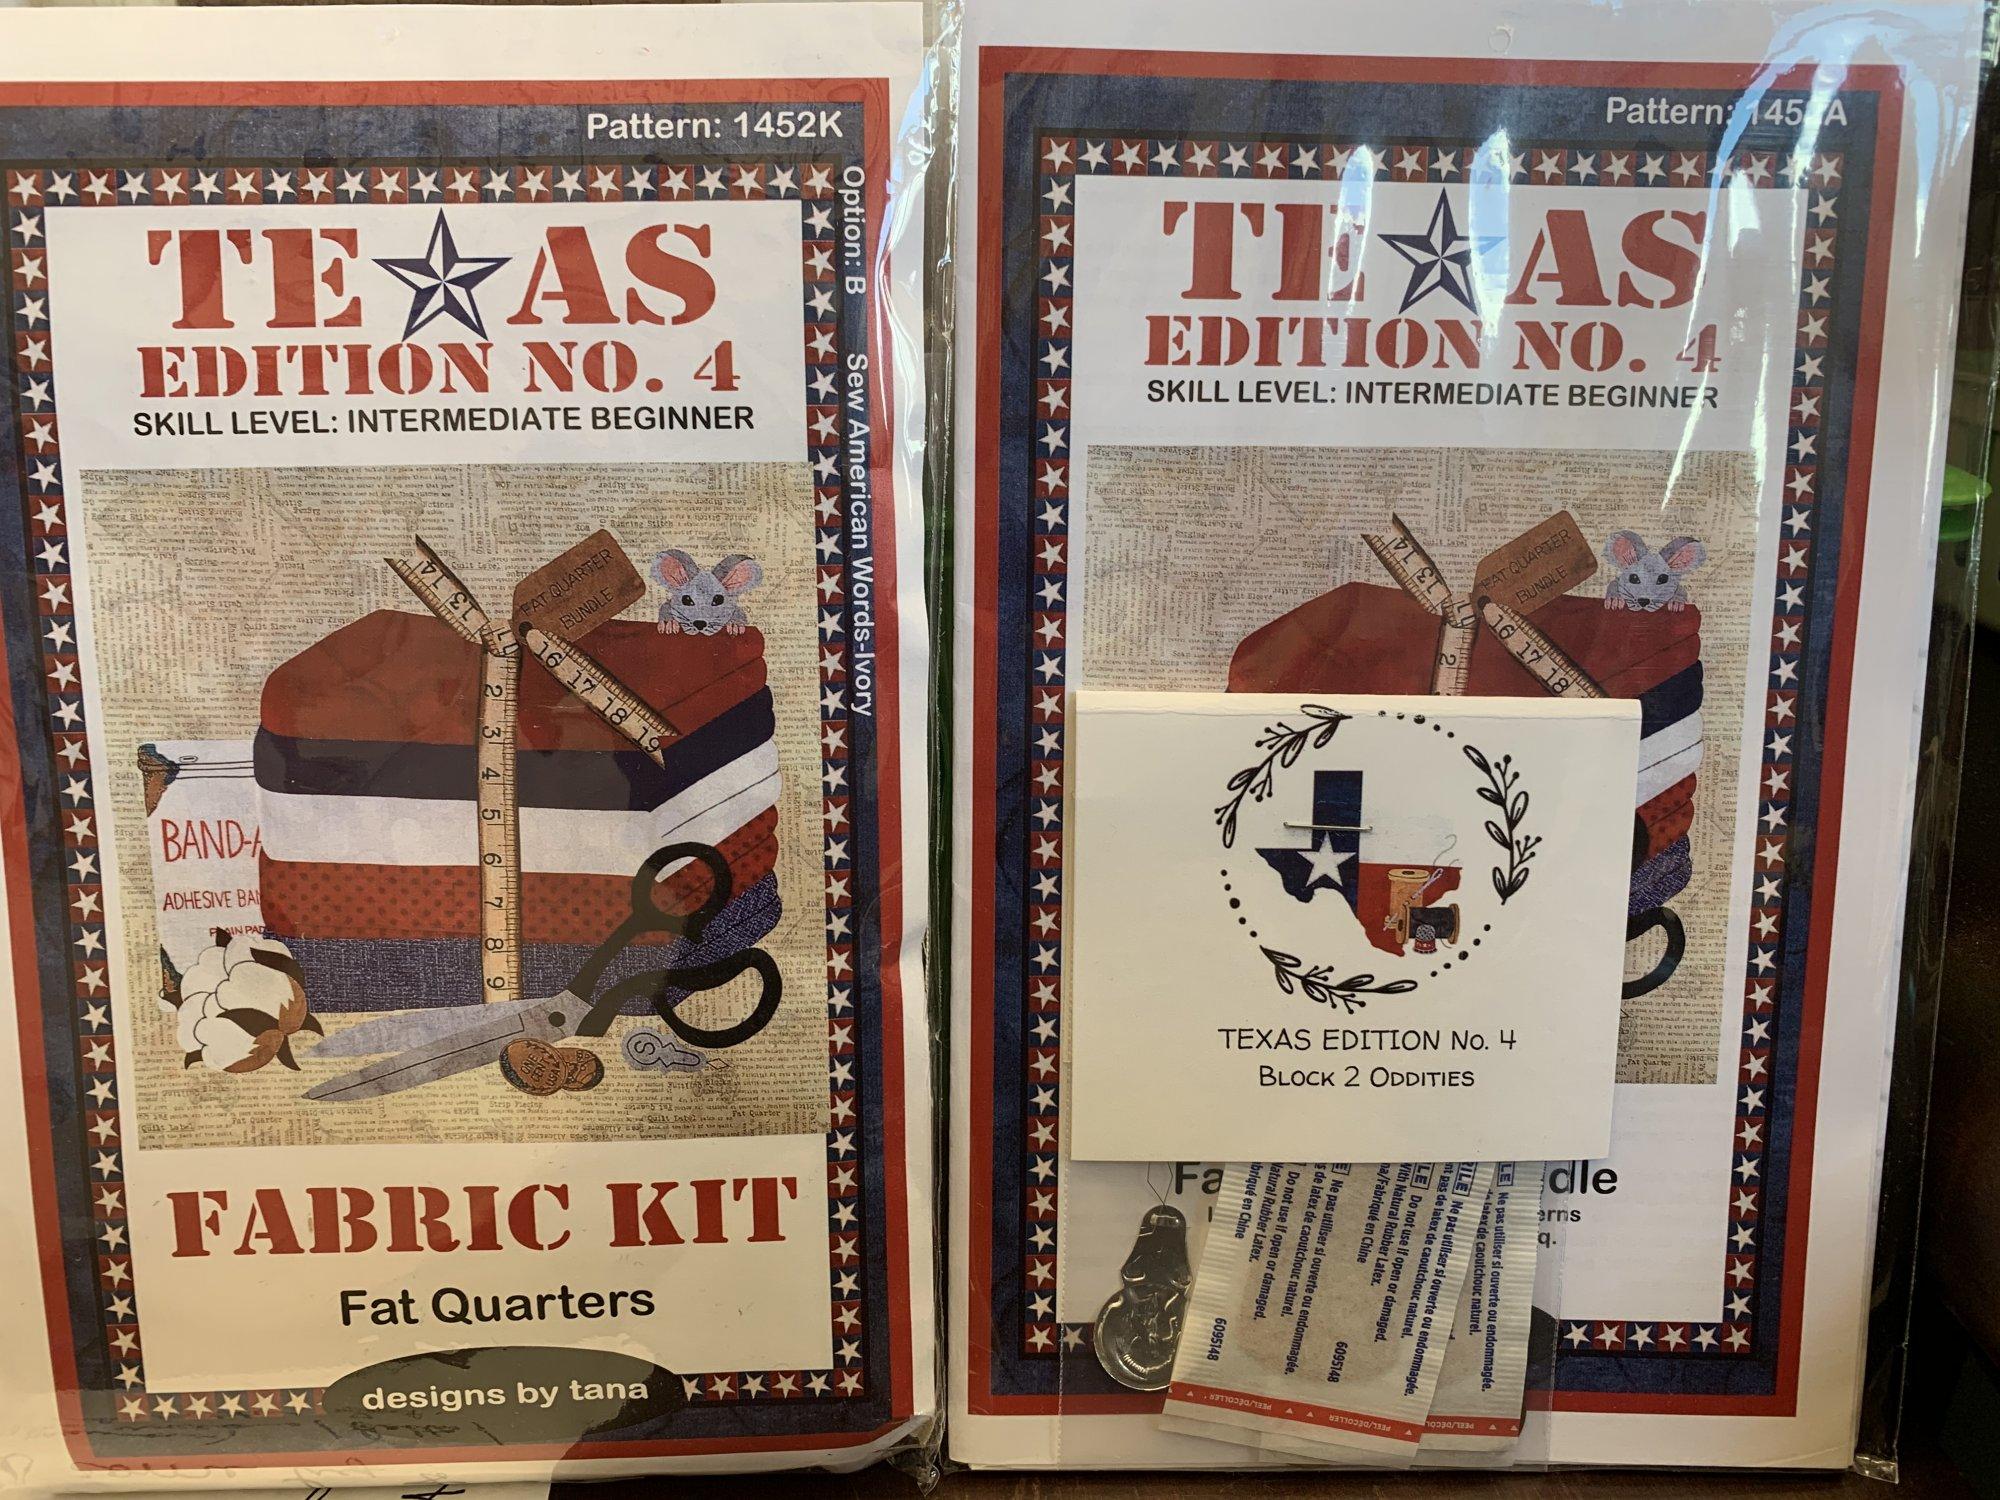 Texas BOM Quiltin' N Texas - Fat Quarter Bundle Block 1452A